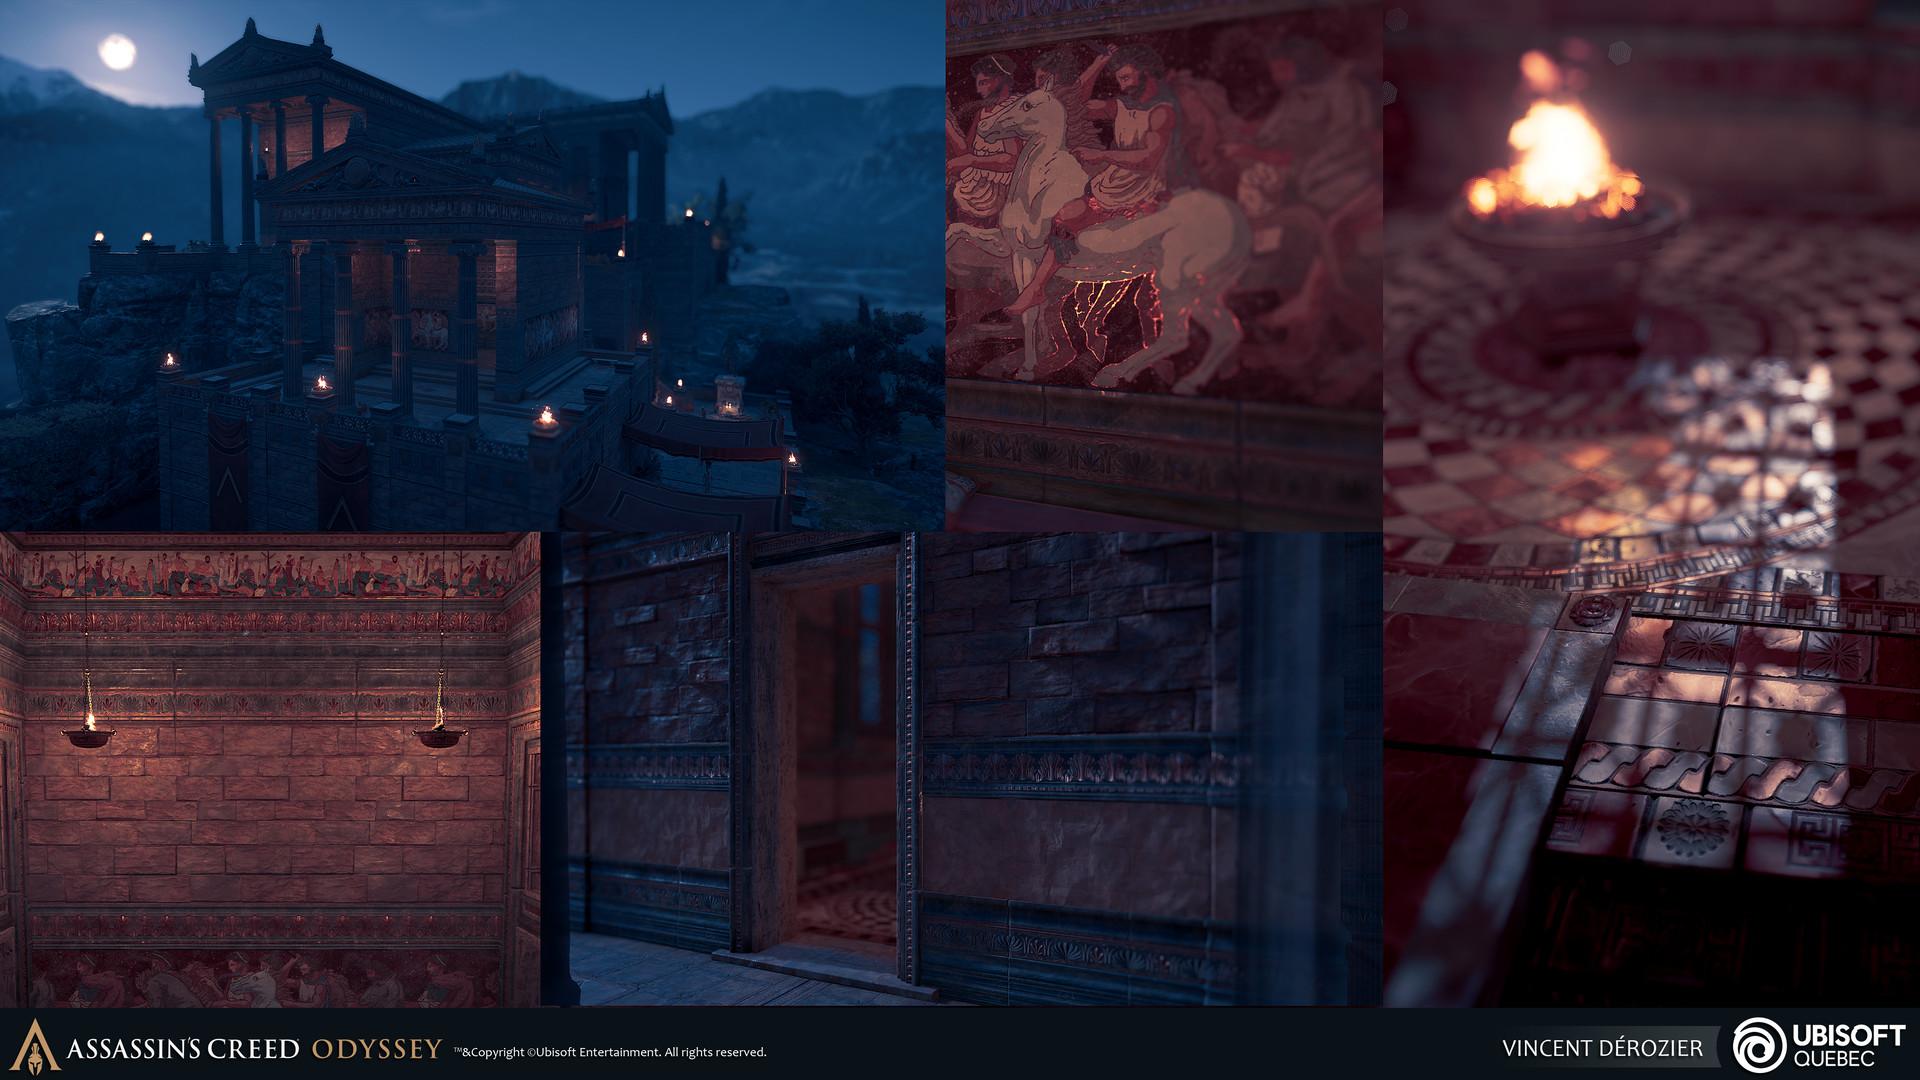 Vincent derozier vincent derozier assassin s creed odyssey dark temples 5